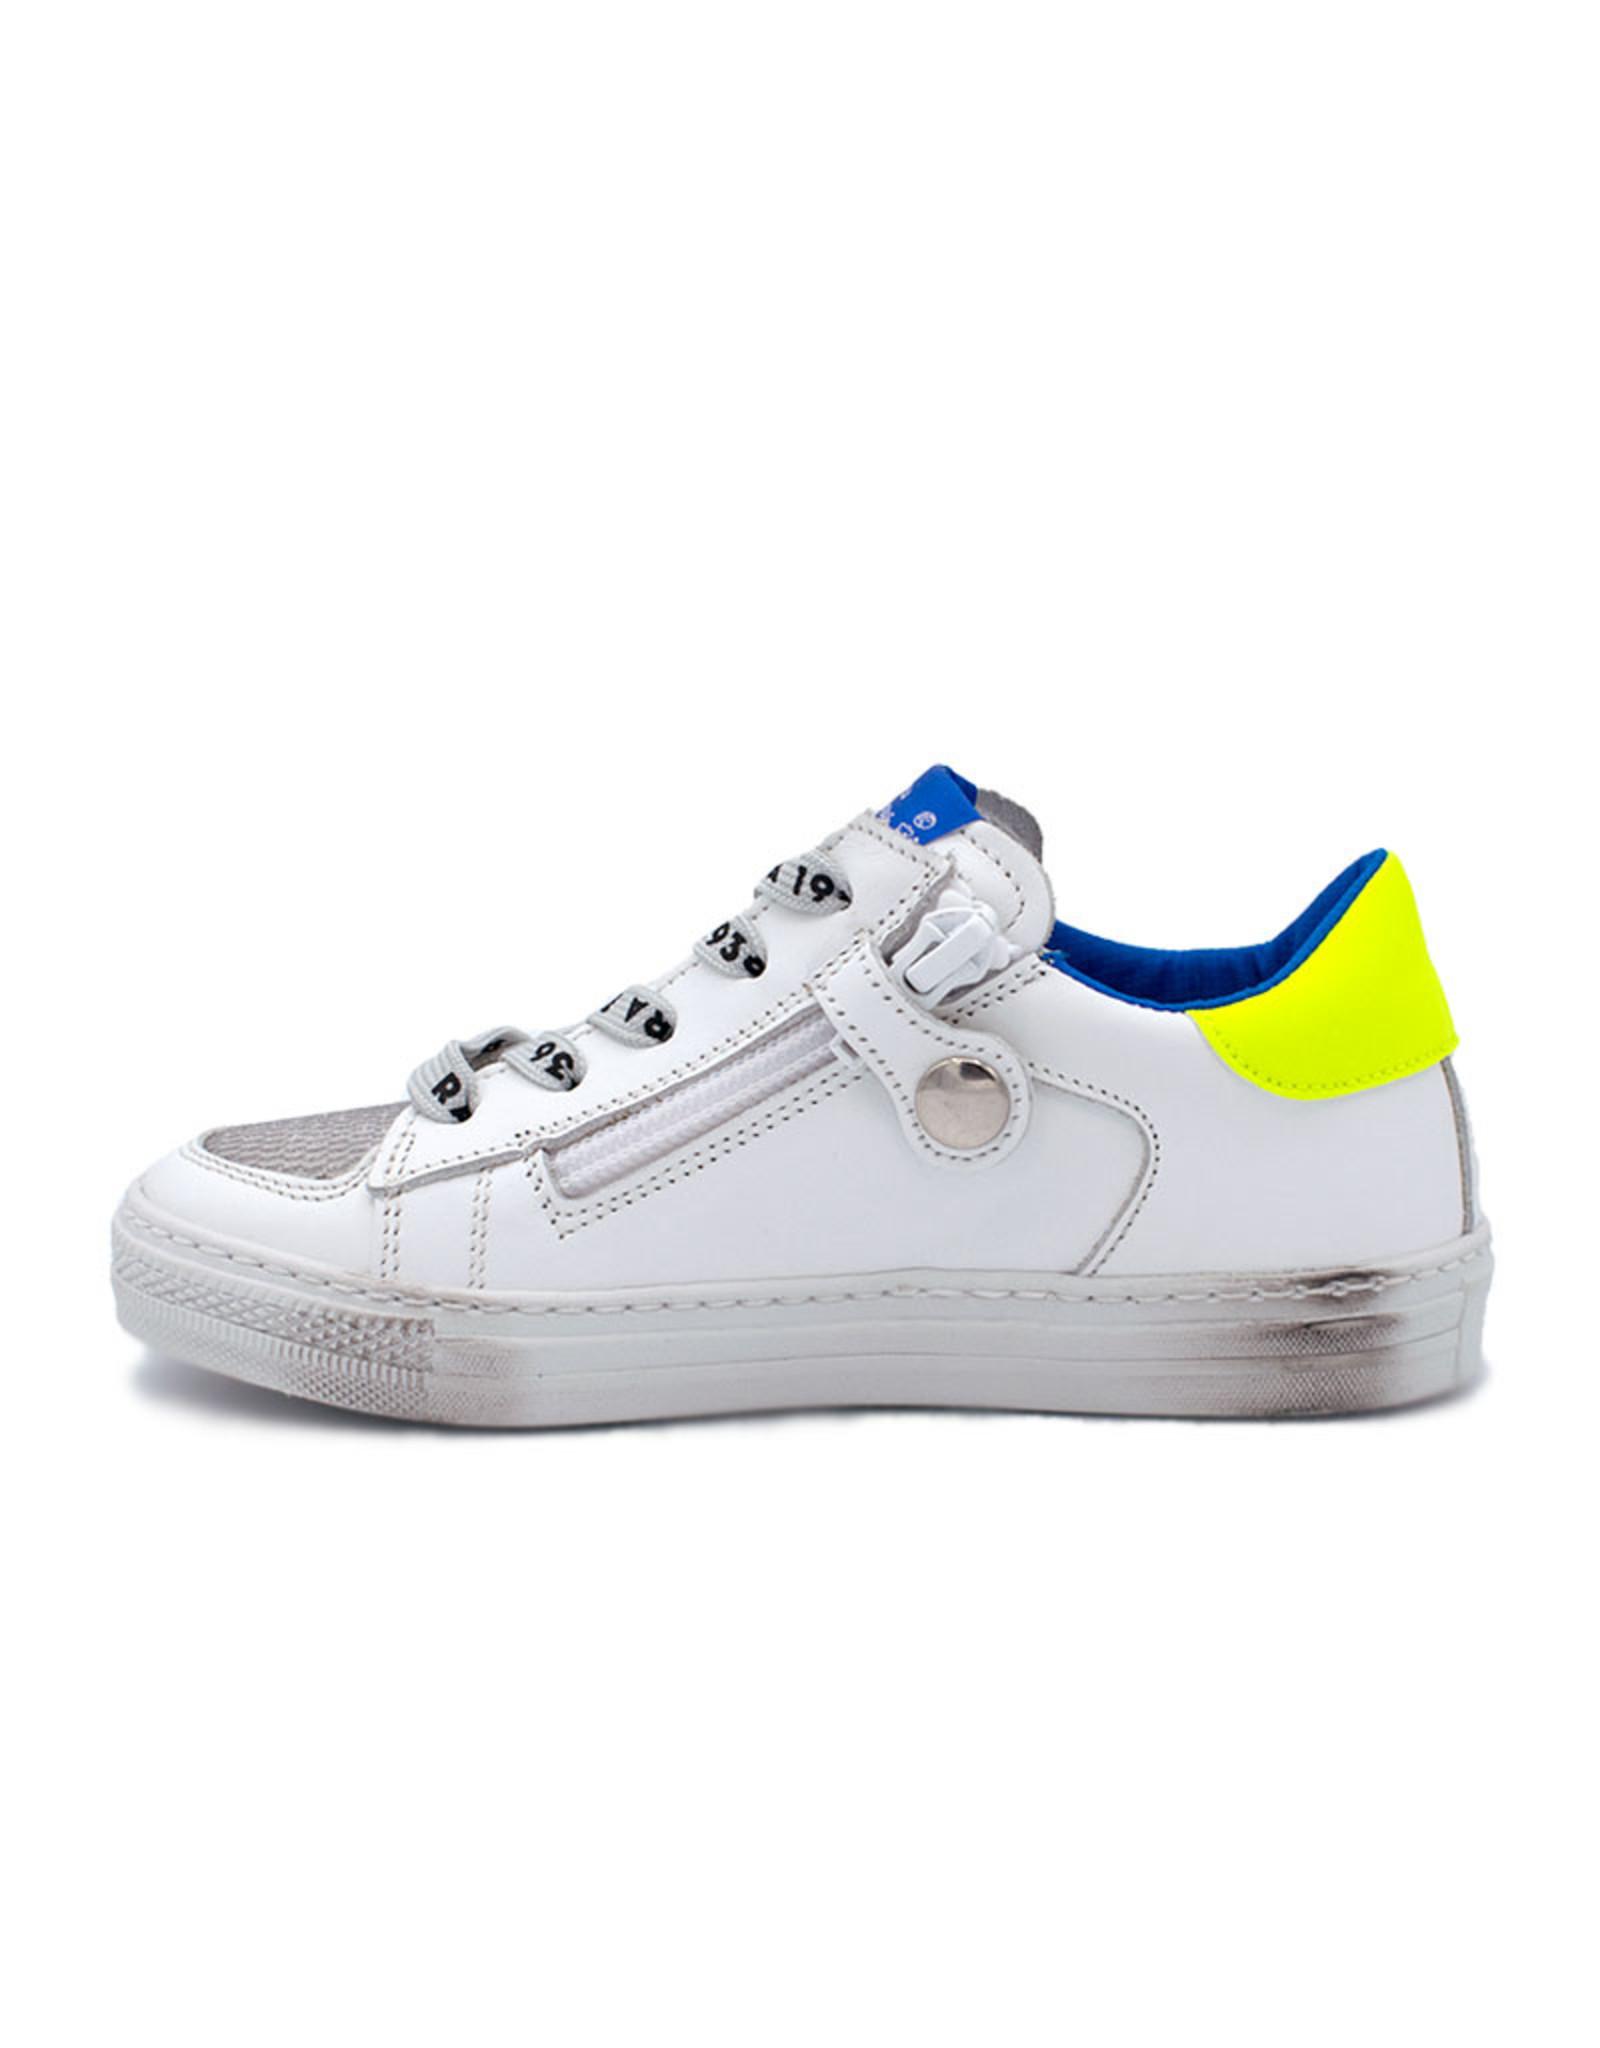 RONDINELLA RONDINELLA sneaker blauw fluo